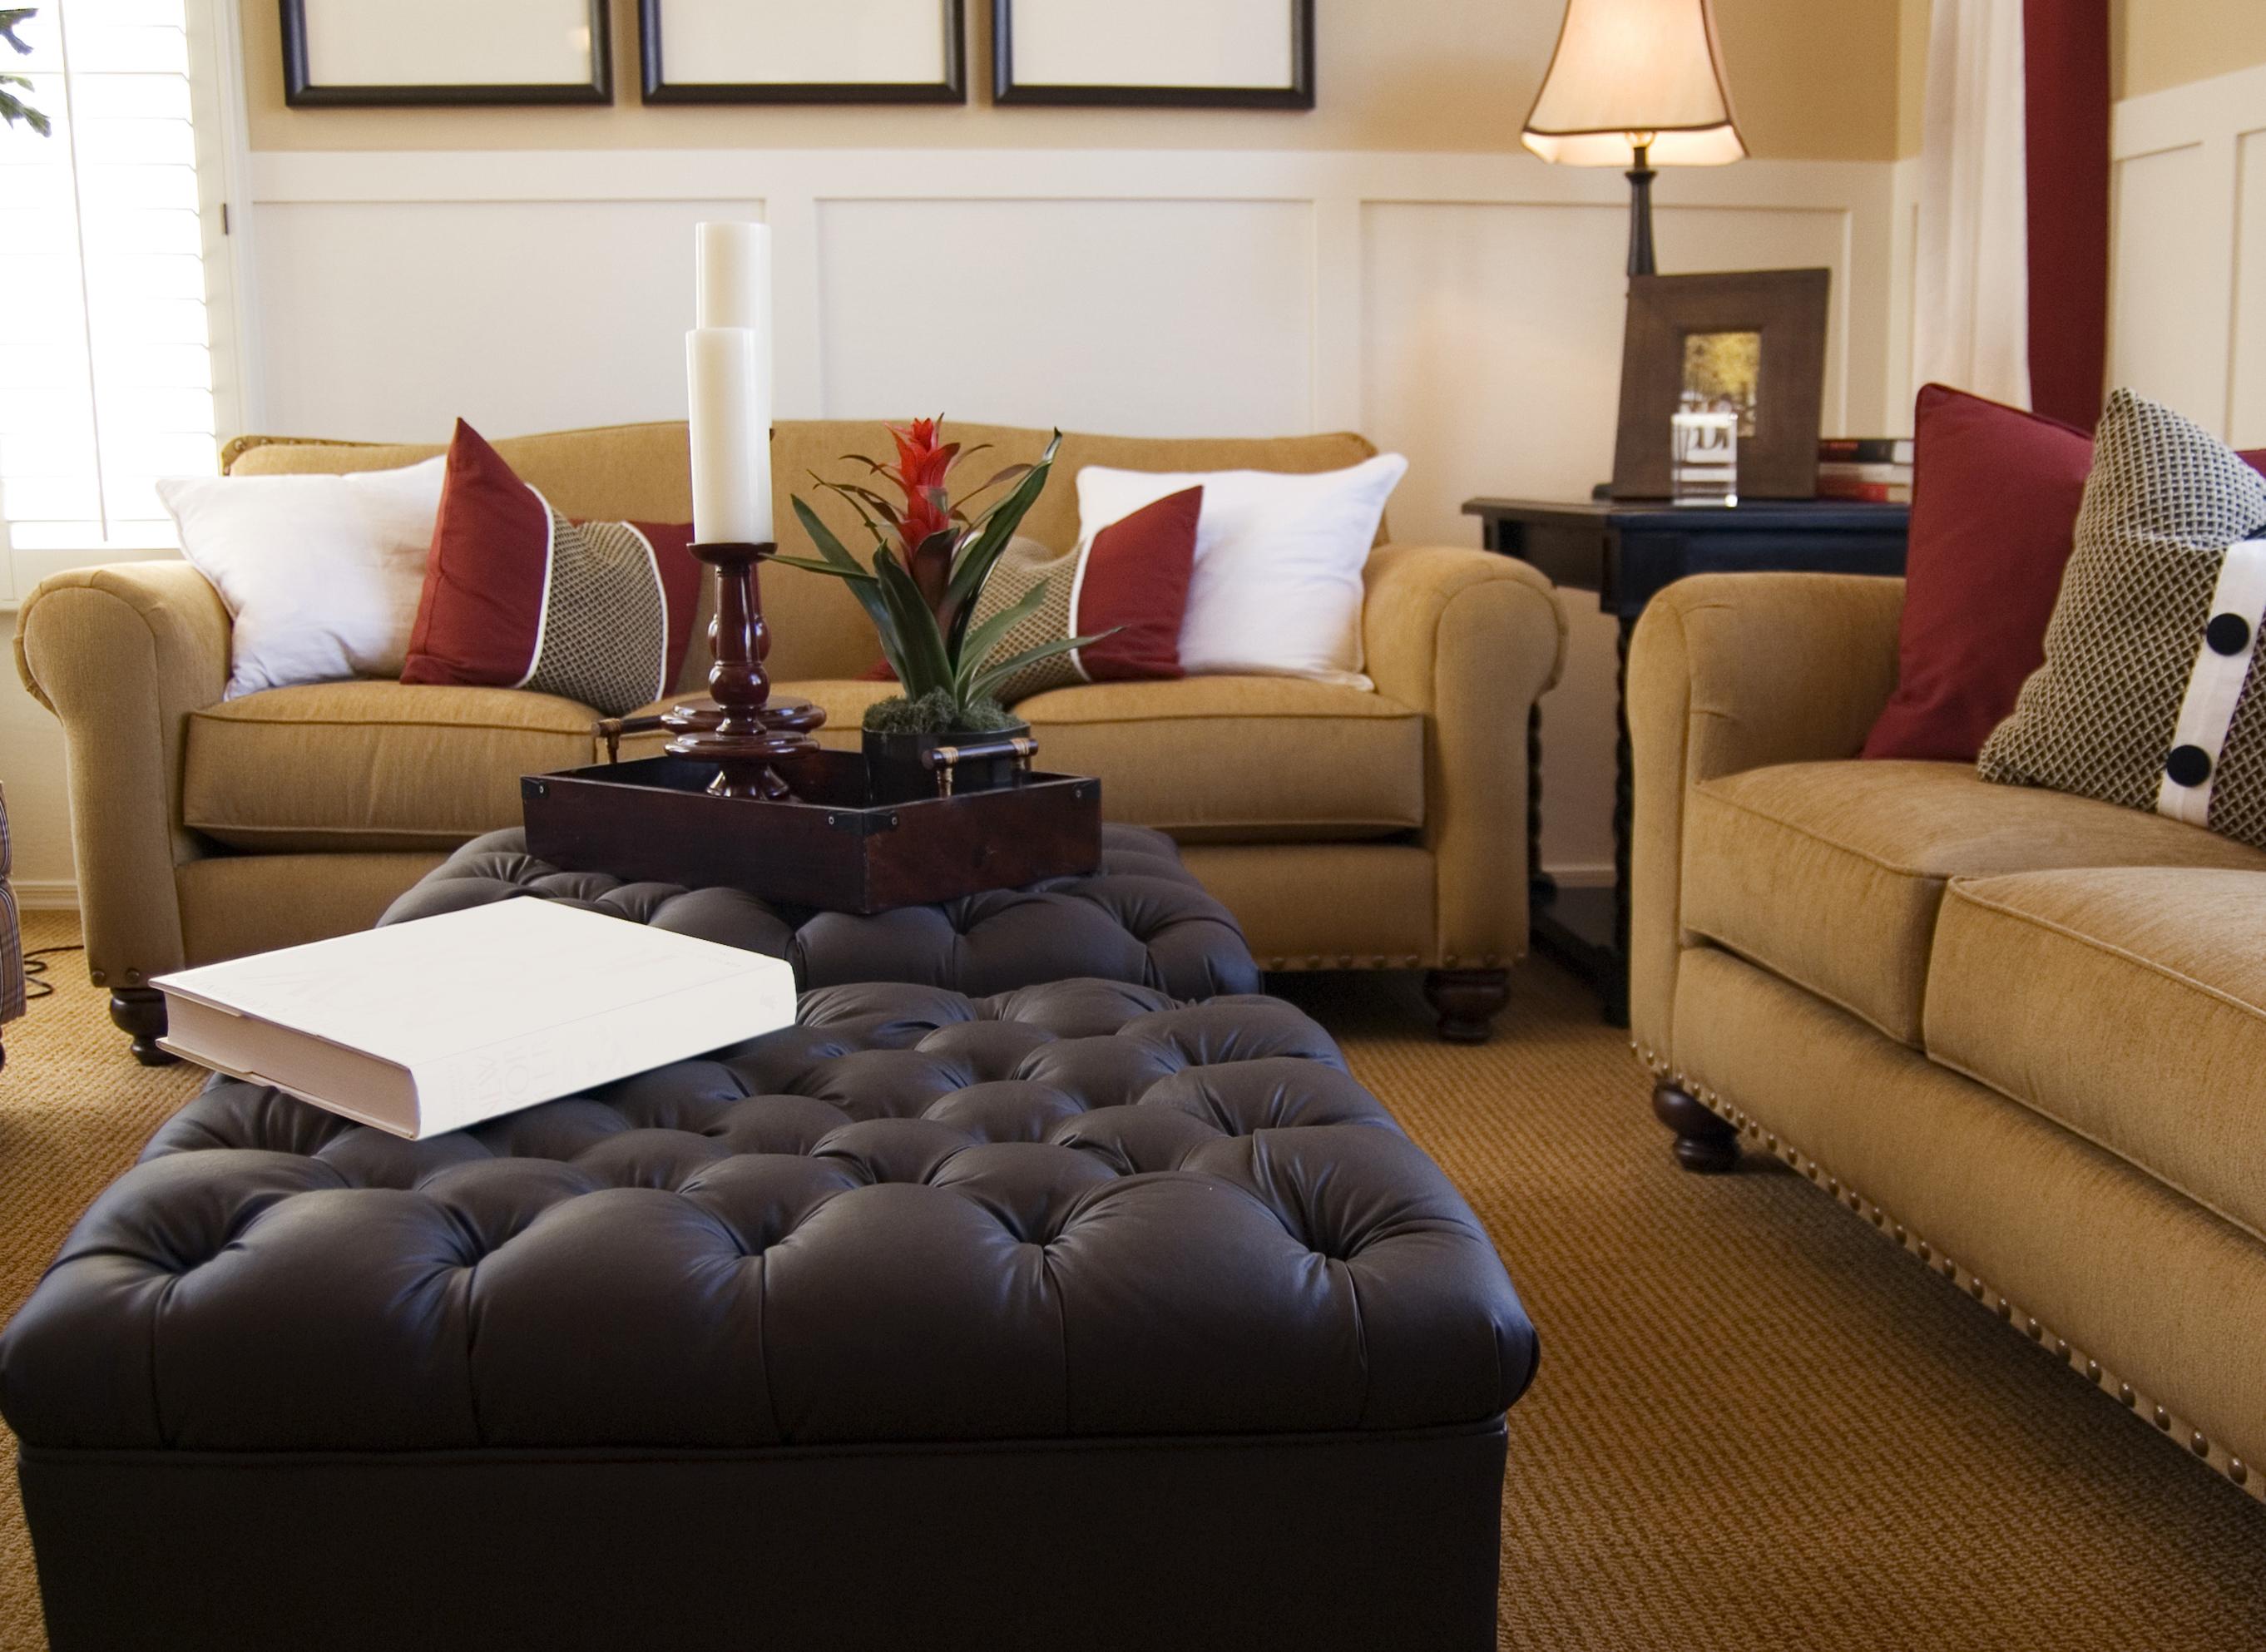 Feng Shui Design Ideas For An Auspicious Living Room